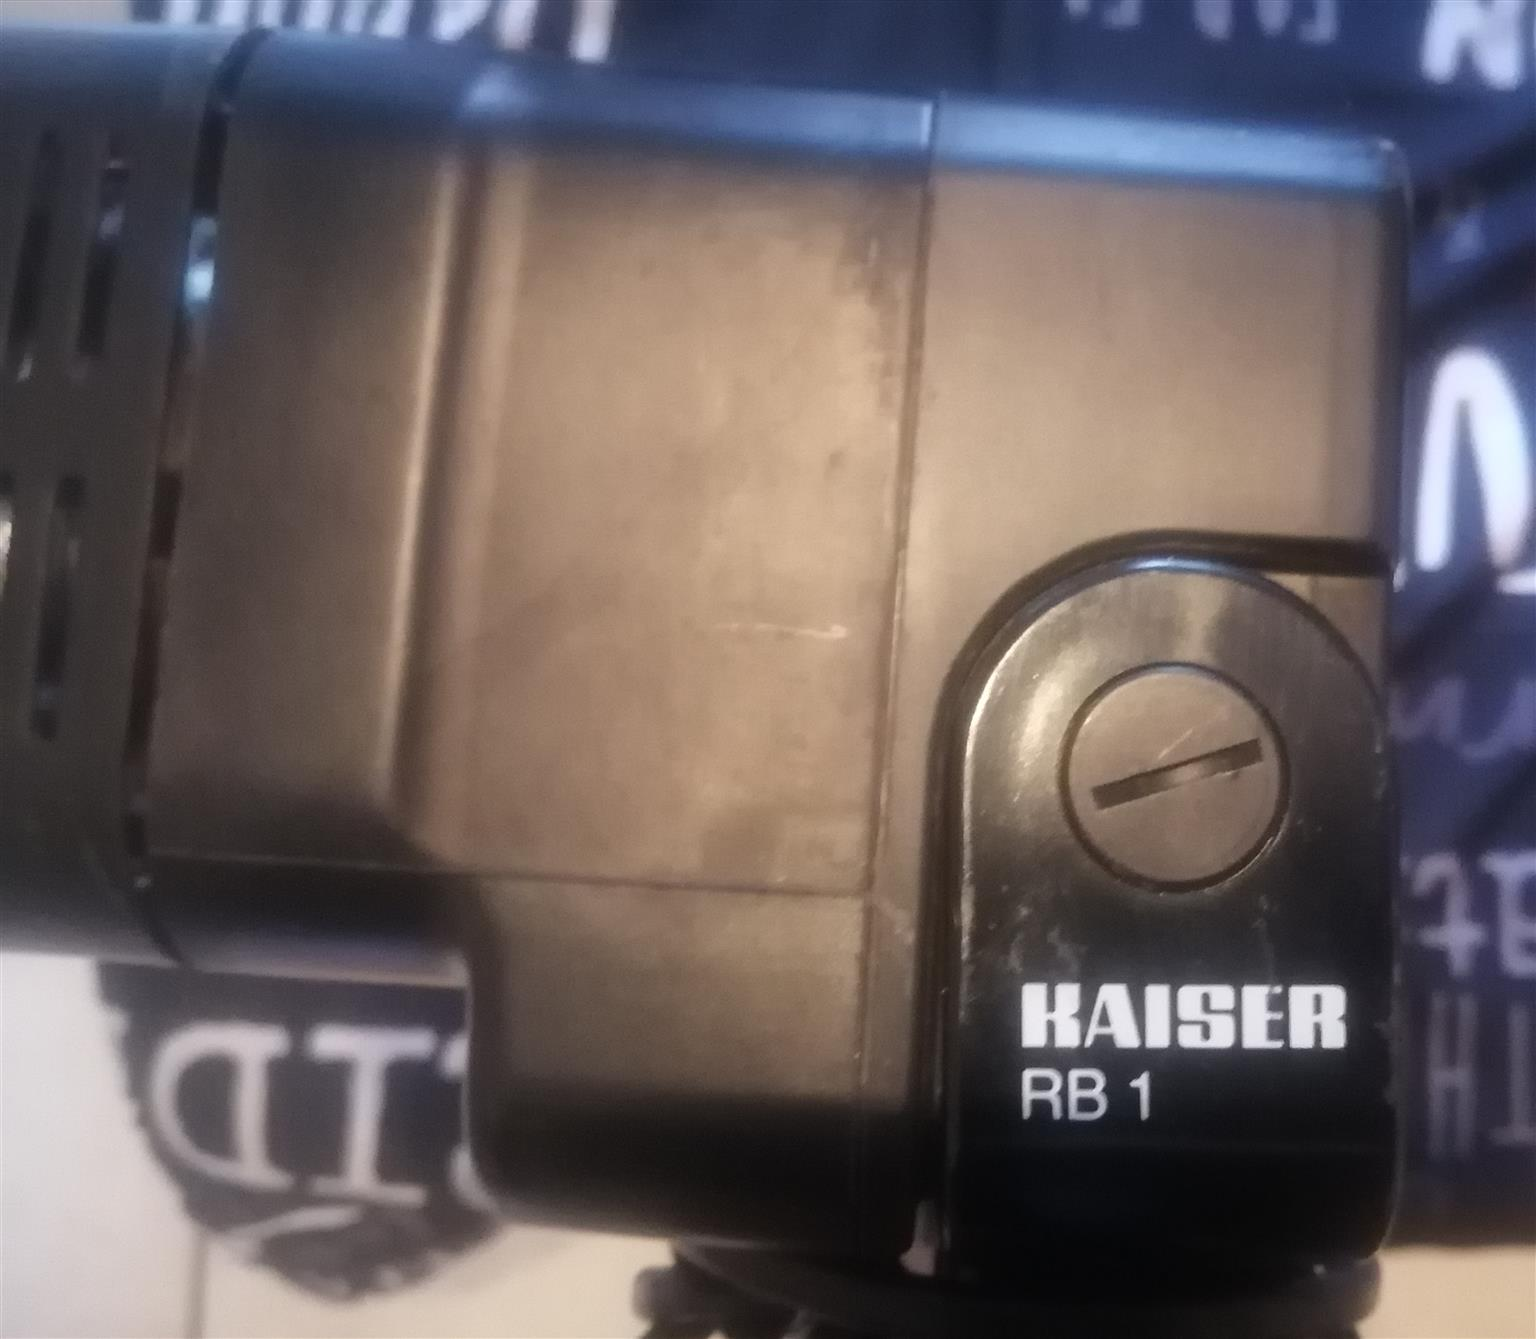 KAISER HFB 5550 Halogen Copy Stand Light Set 650W Adjustable Rails Studio Light